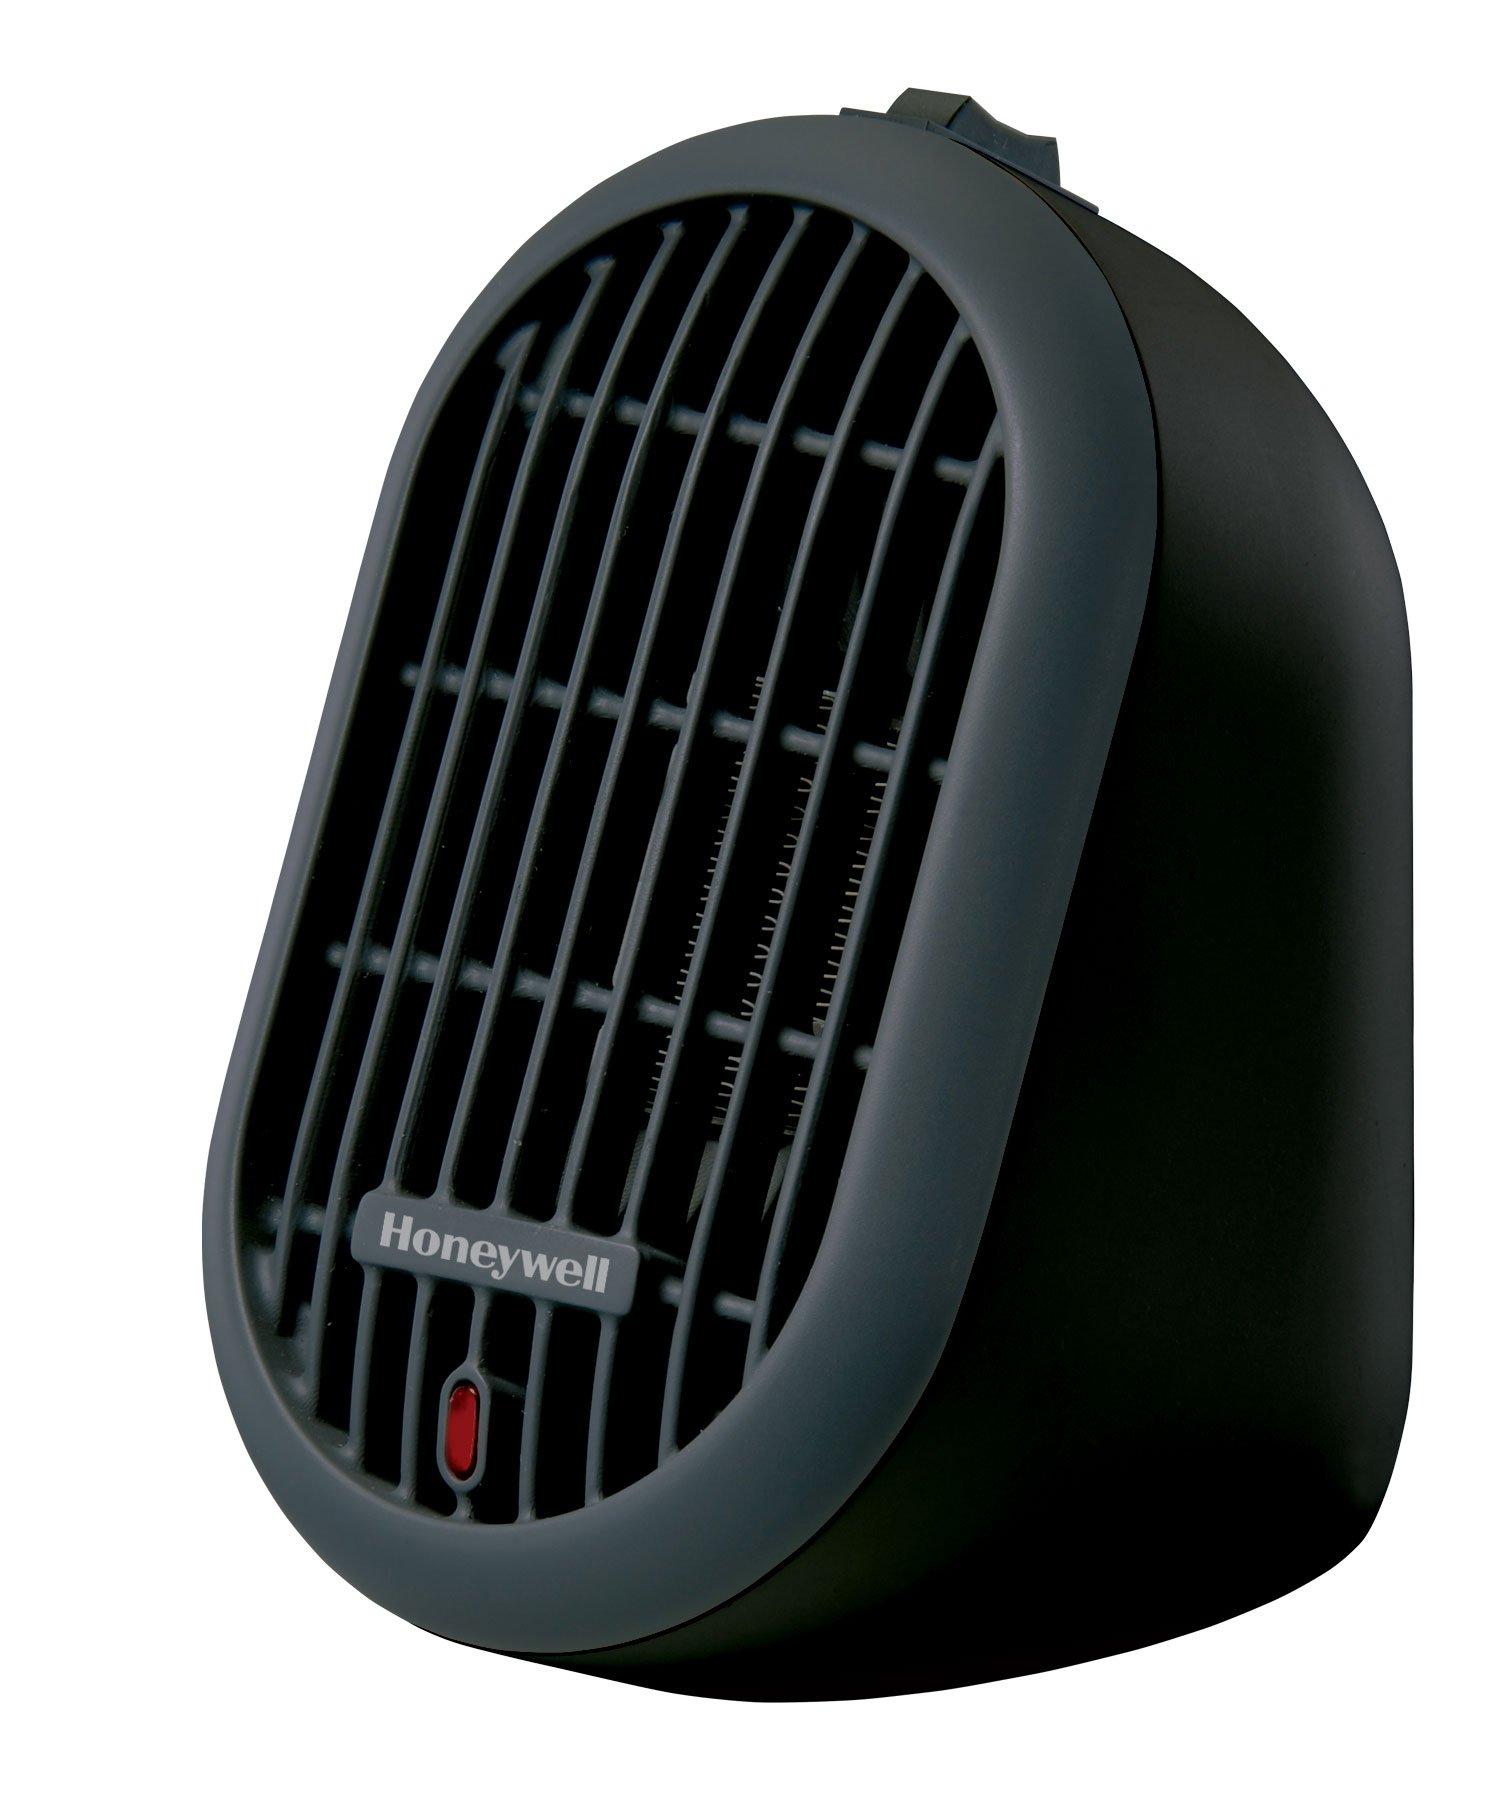 Kaz Honeywell HCE100B Heat Bud Ceramic Heater, Black